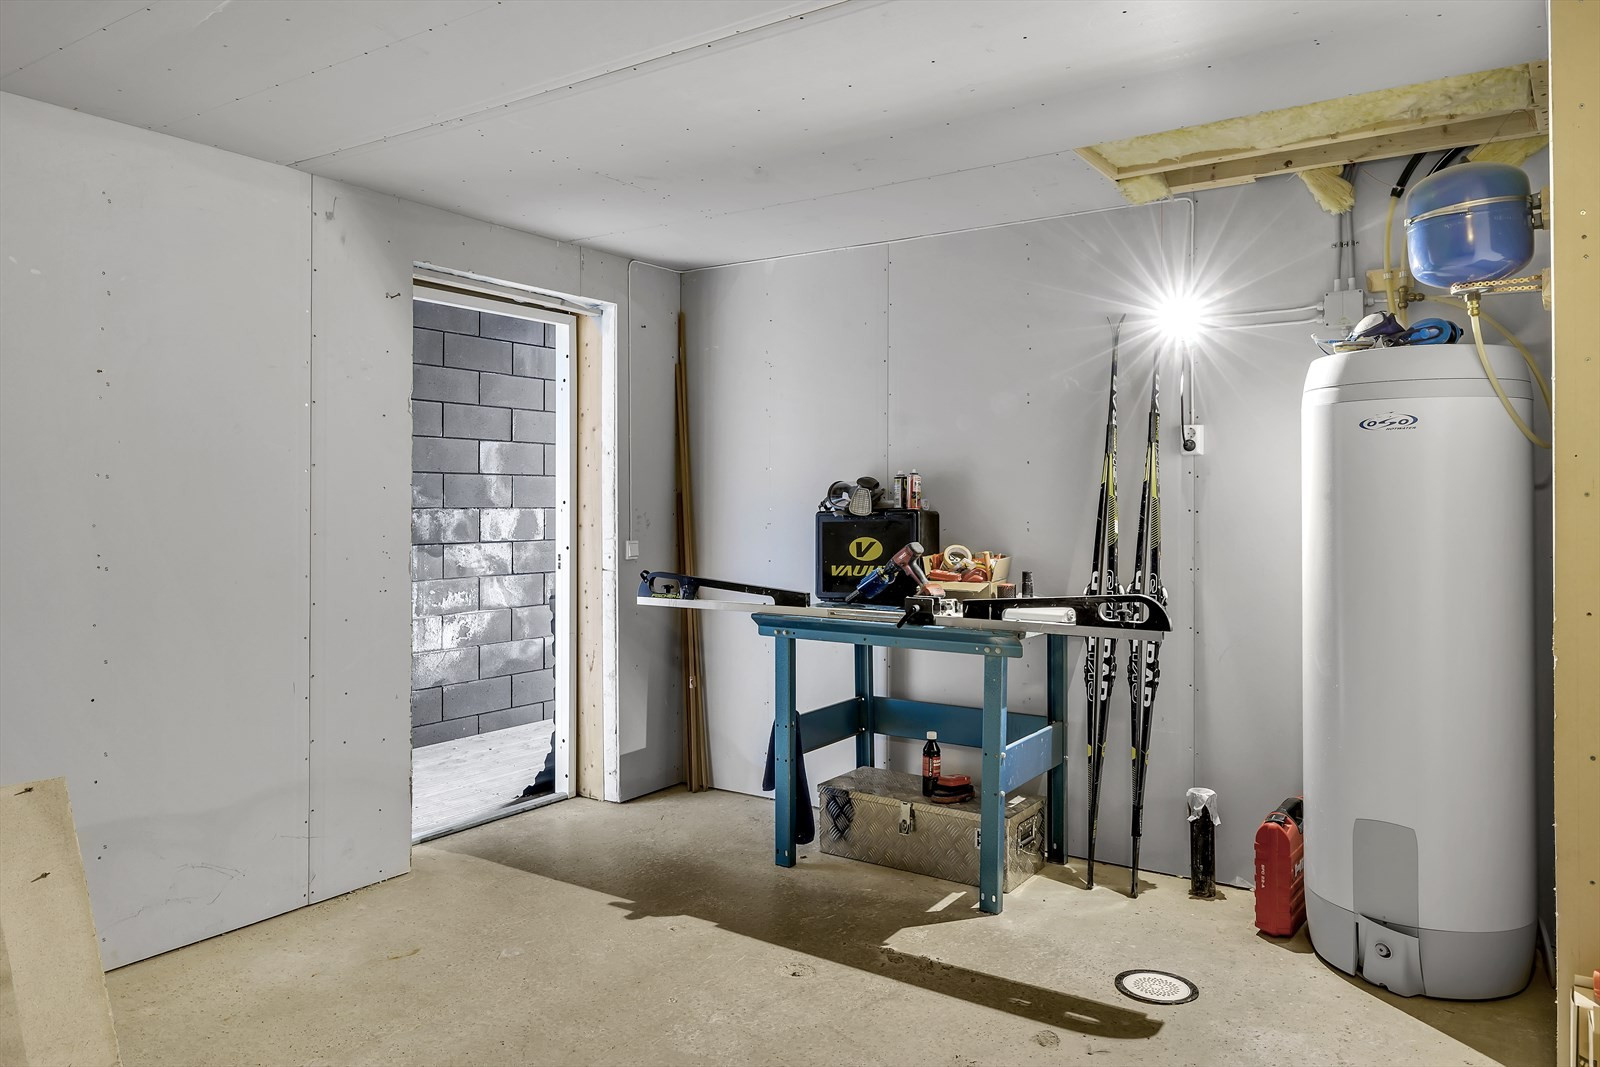 Stort disponibelt rom under garasjen